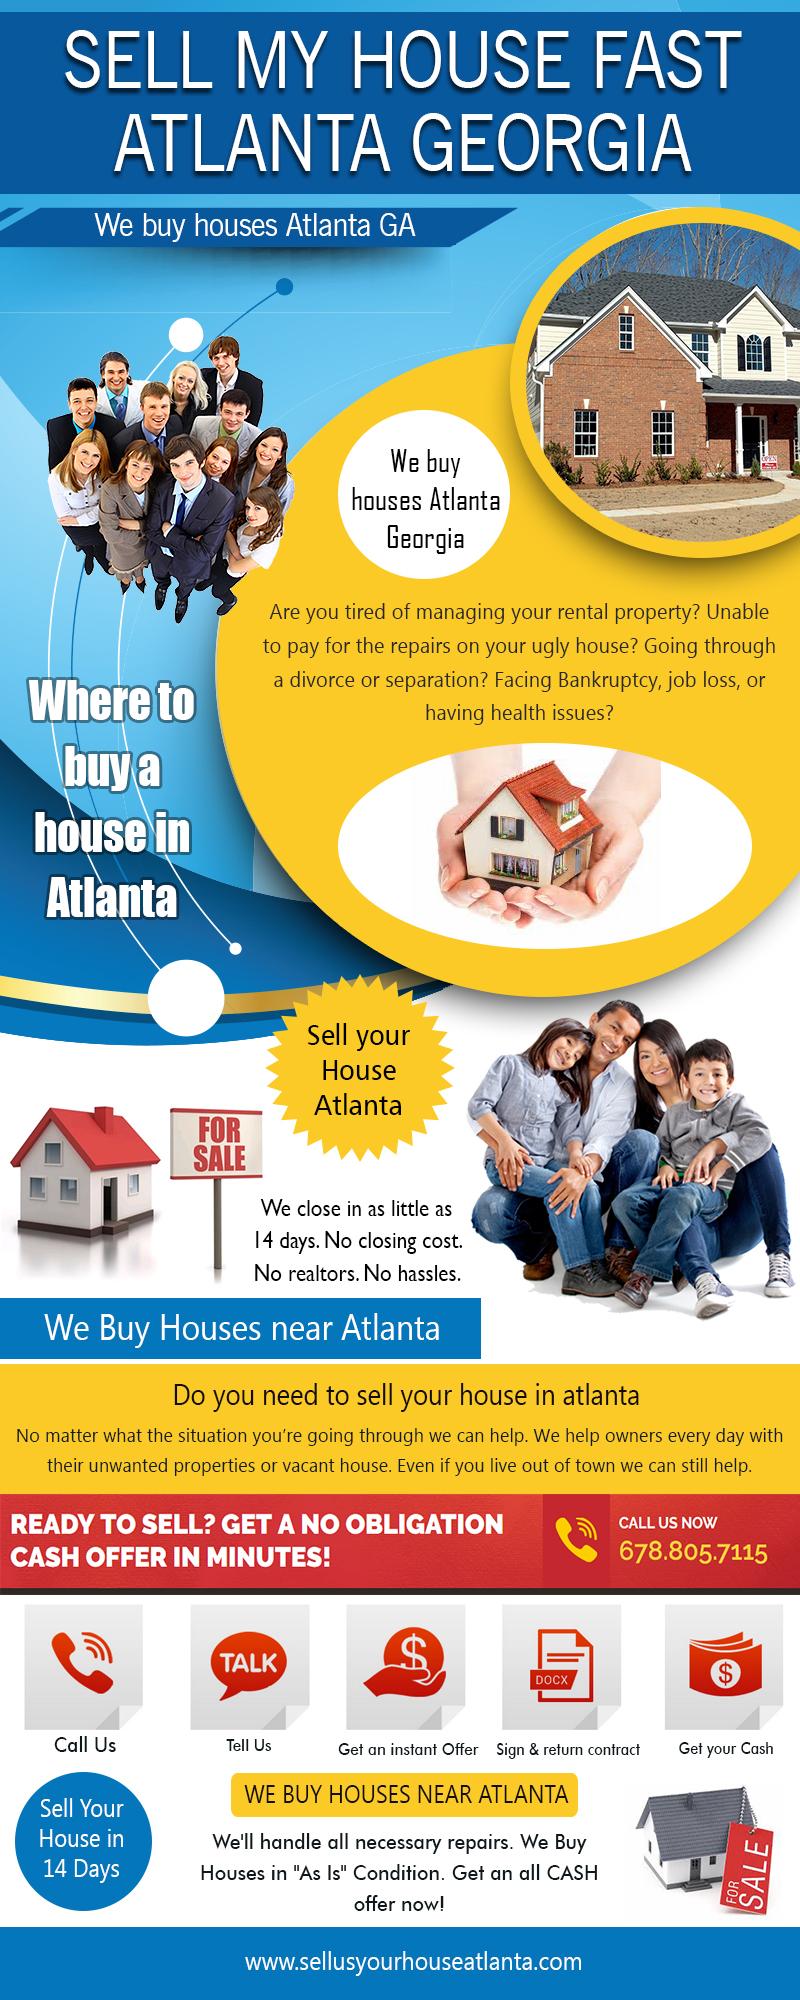 Sell my House Fast Atlanta Georgia|www.sellusyourhouseatlanta.com|6788057115